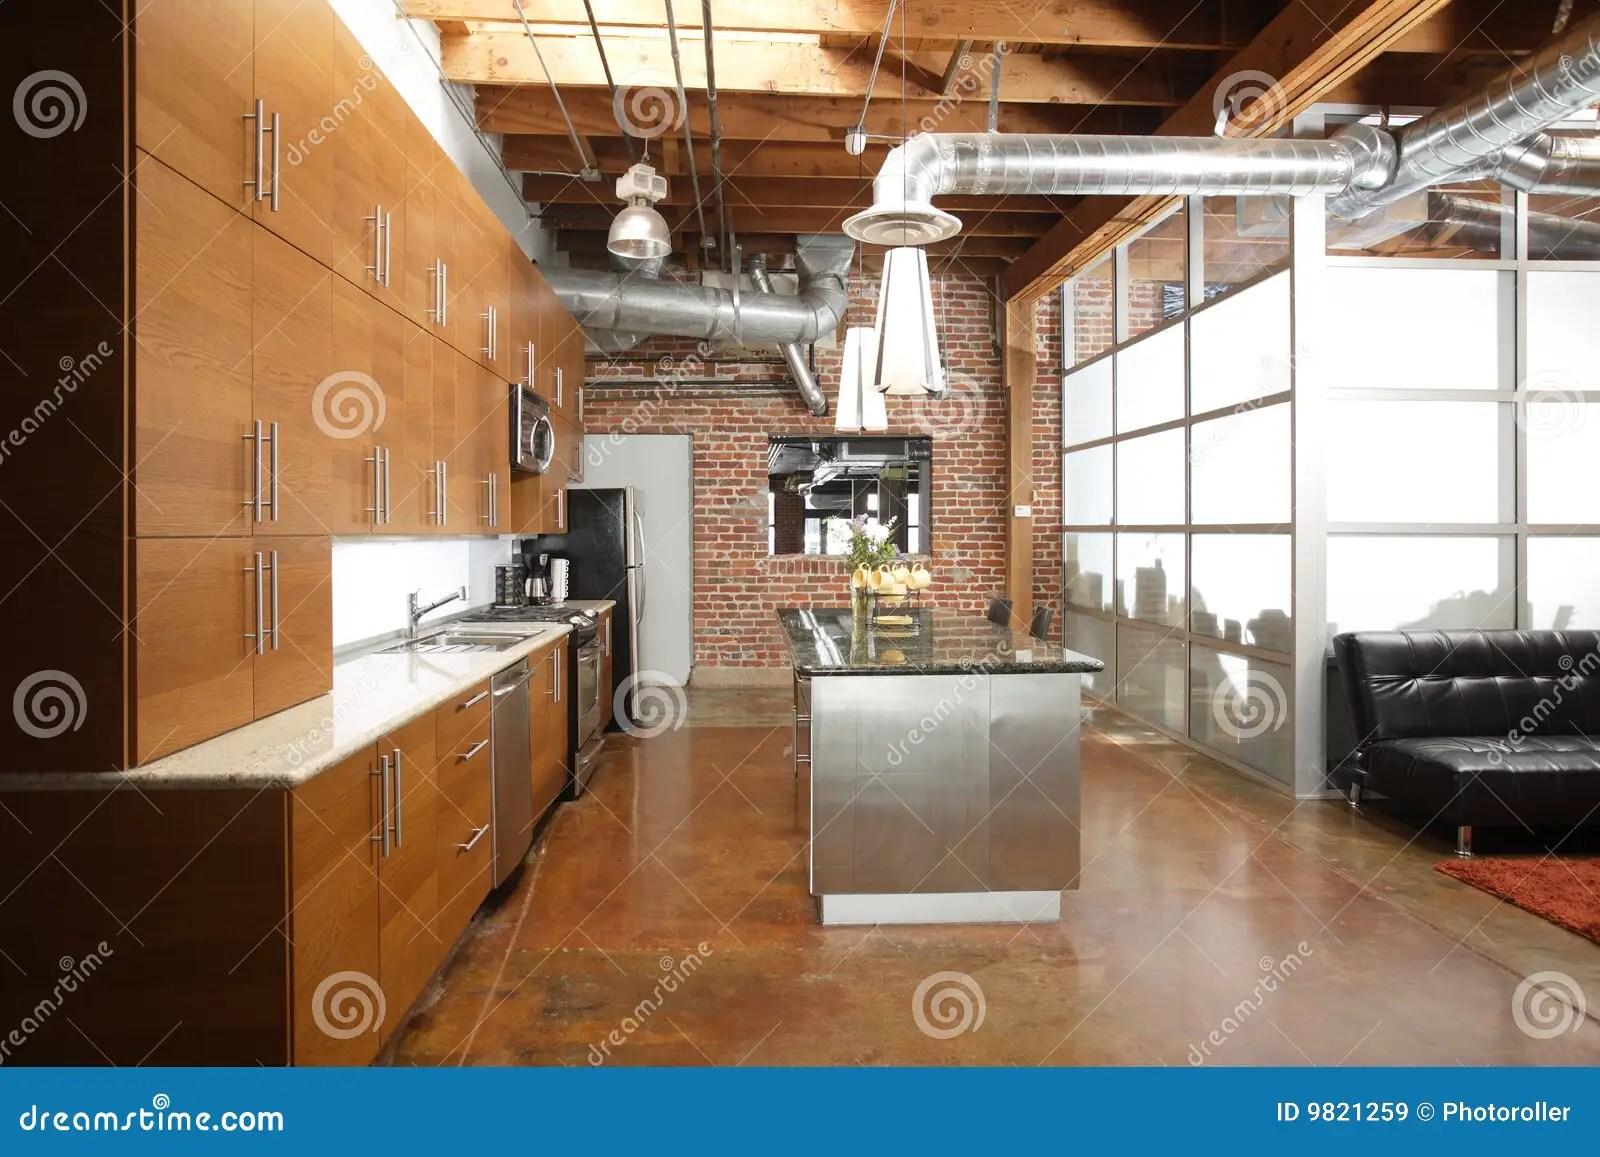 kitchen pantry cupboard backyard design modern loft royalty free stock images - image: 9821259